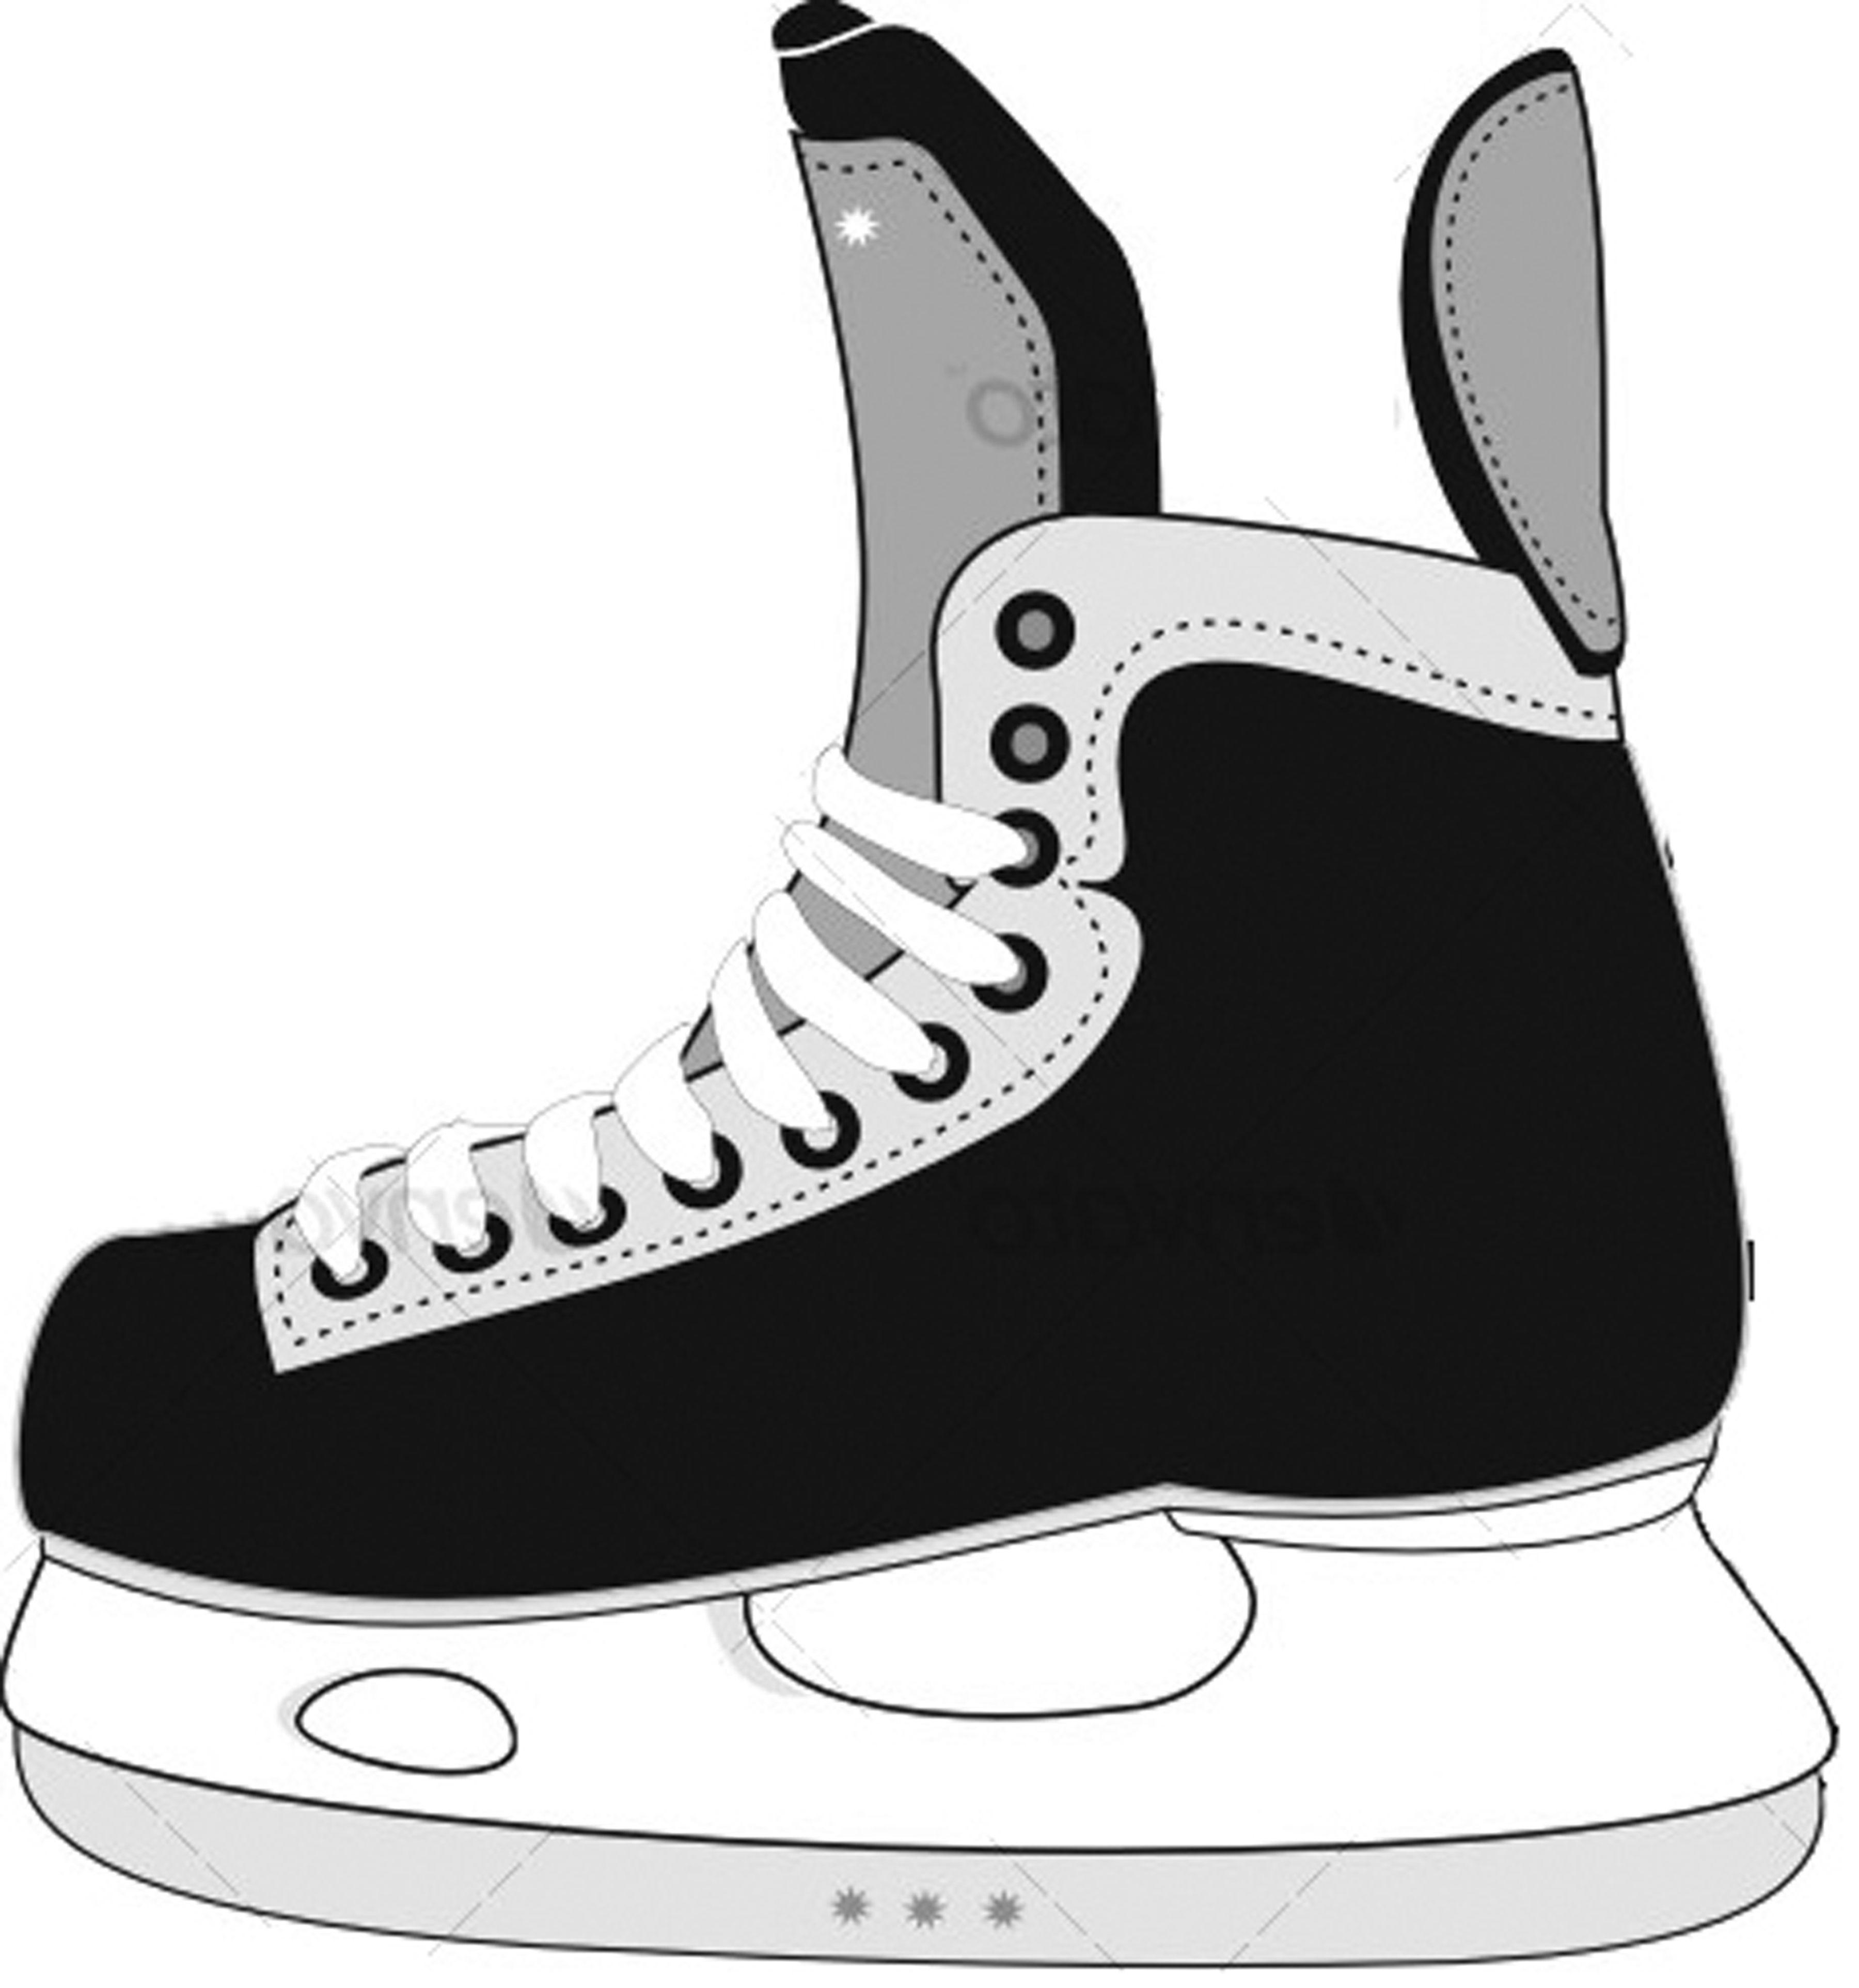 hockey clipart hockey tournament 663 [ 3600 x 3850 Pixel ]